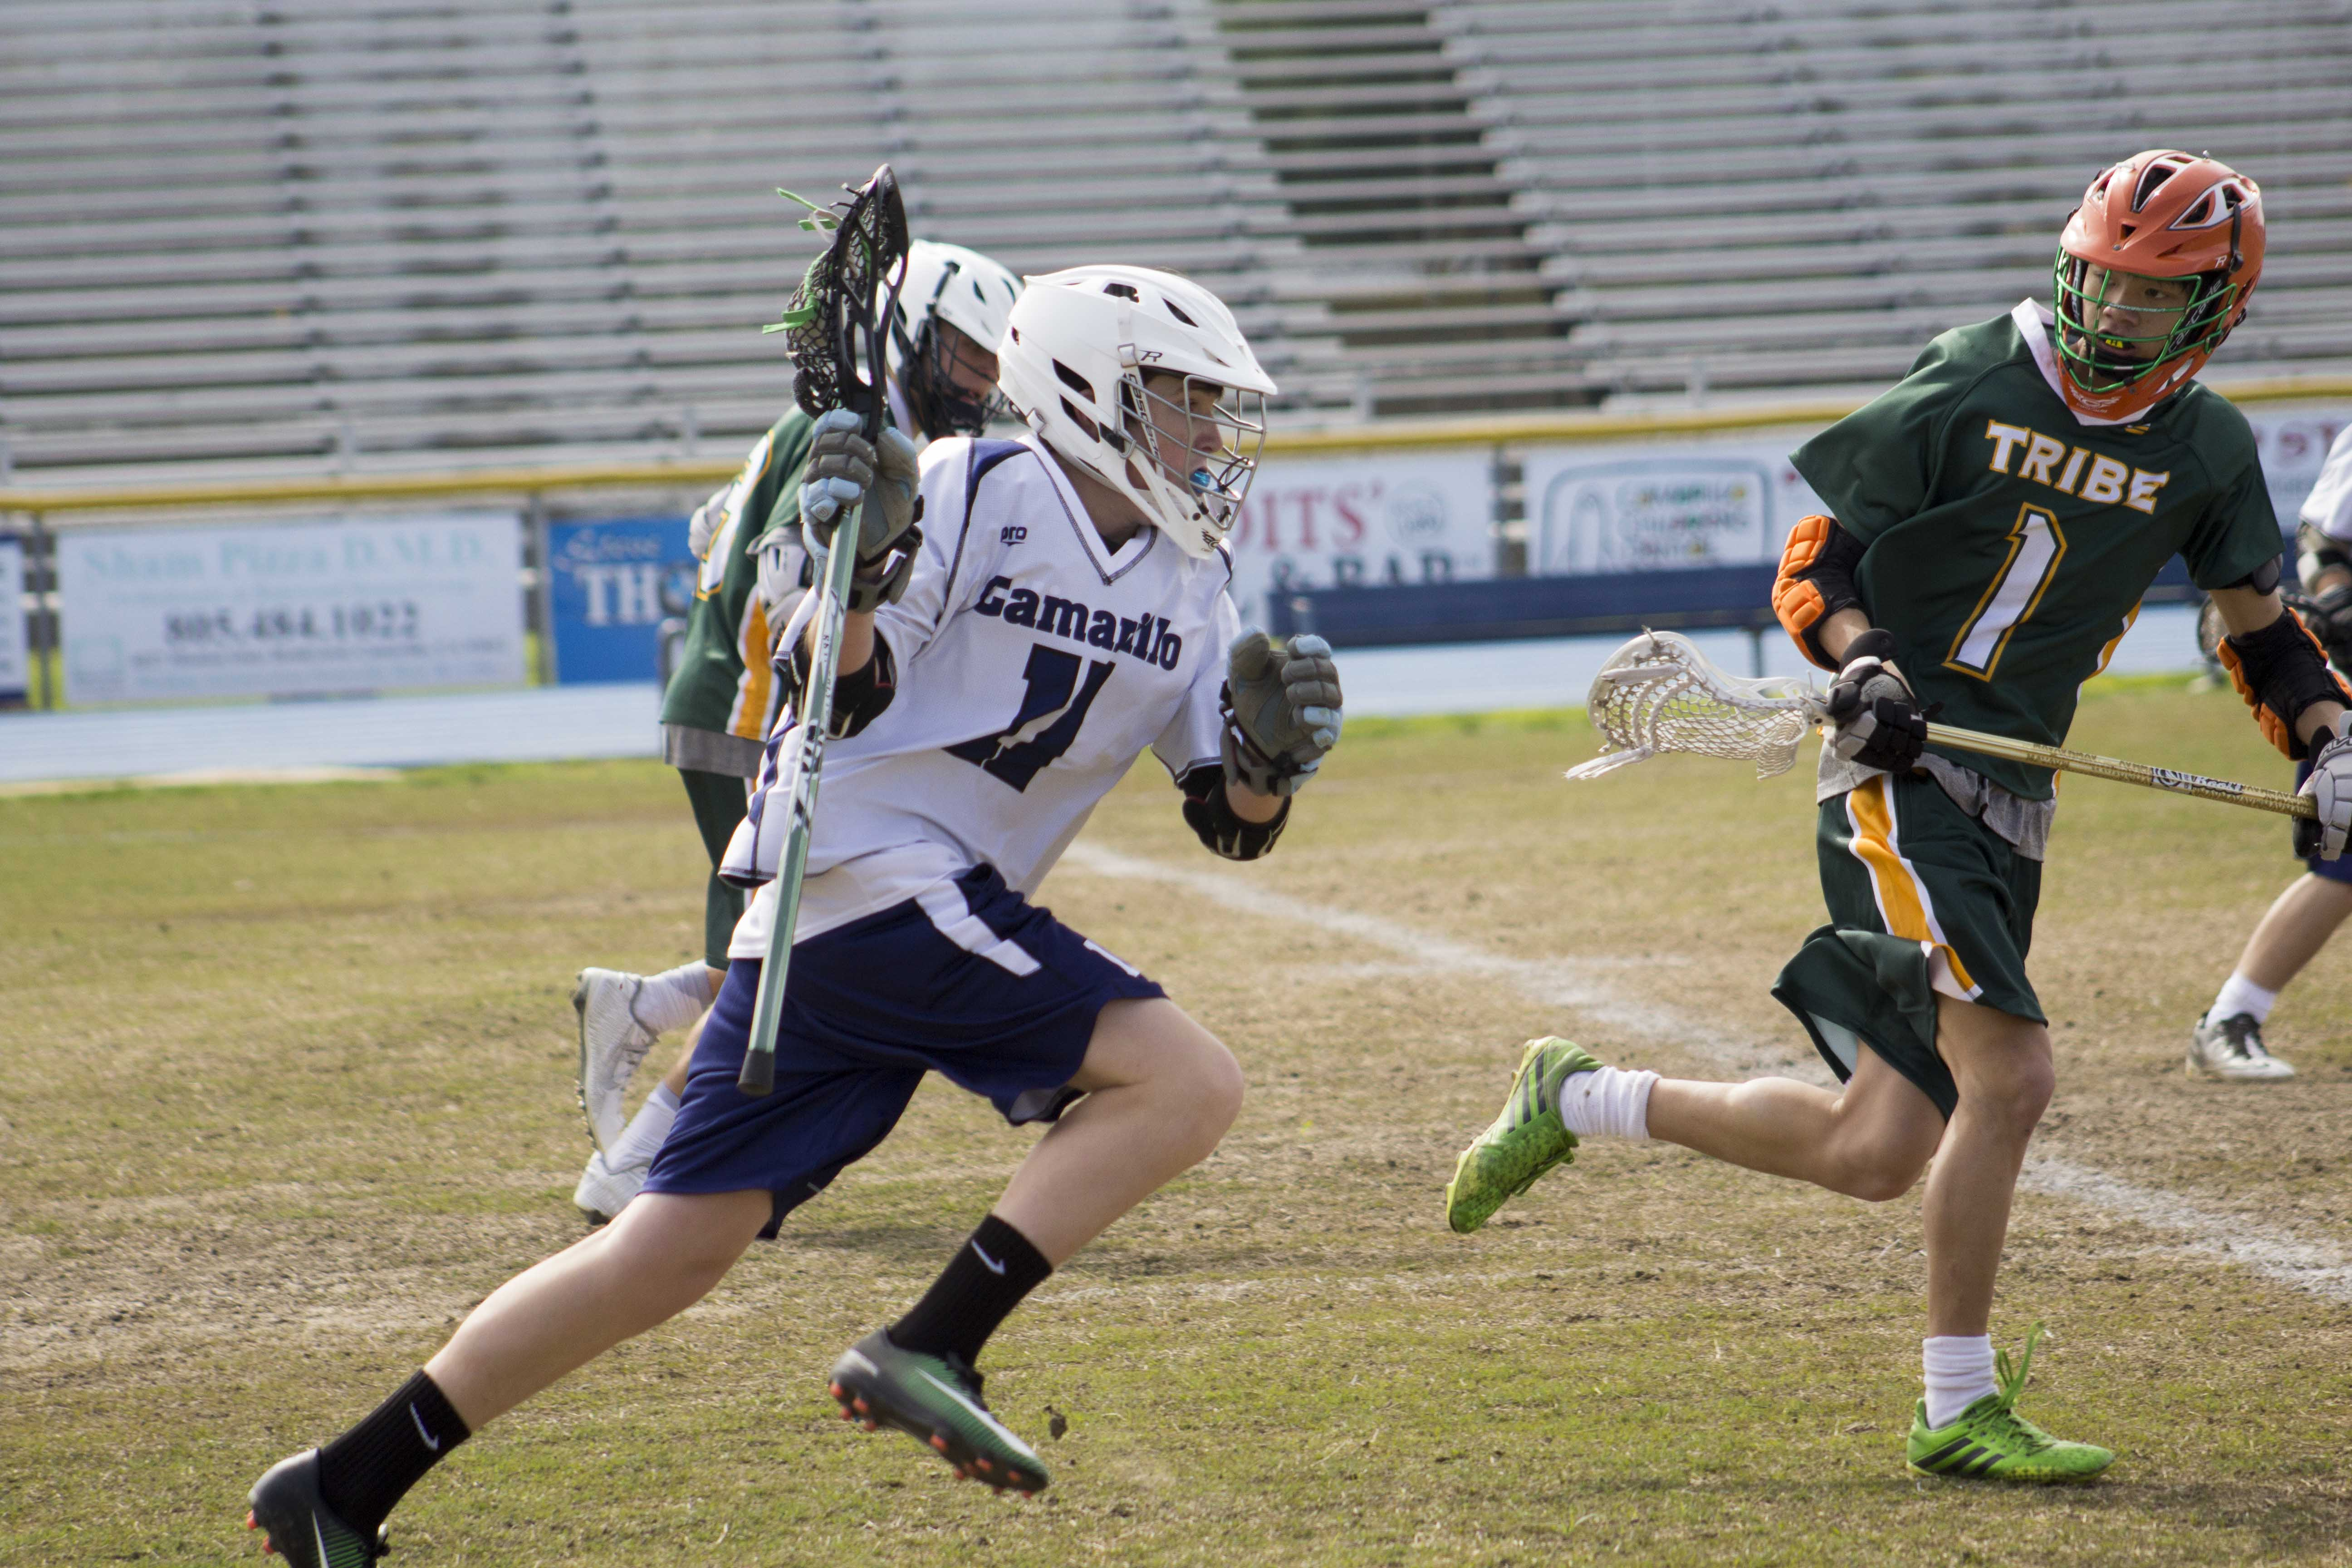 Aidan Carter, freshman